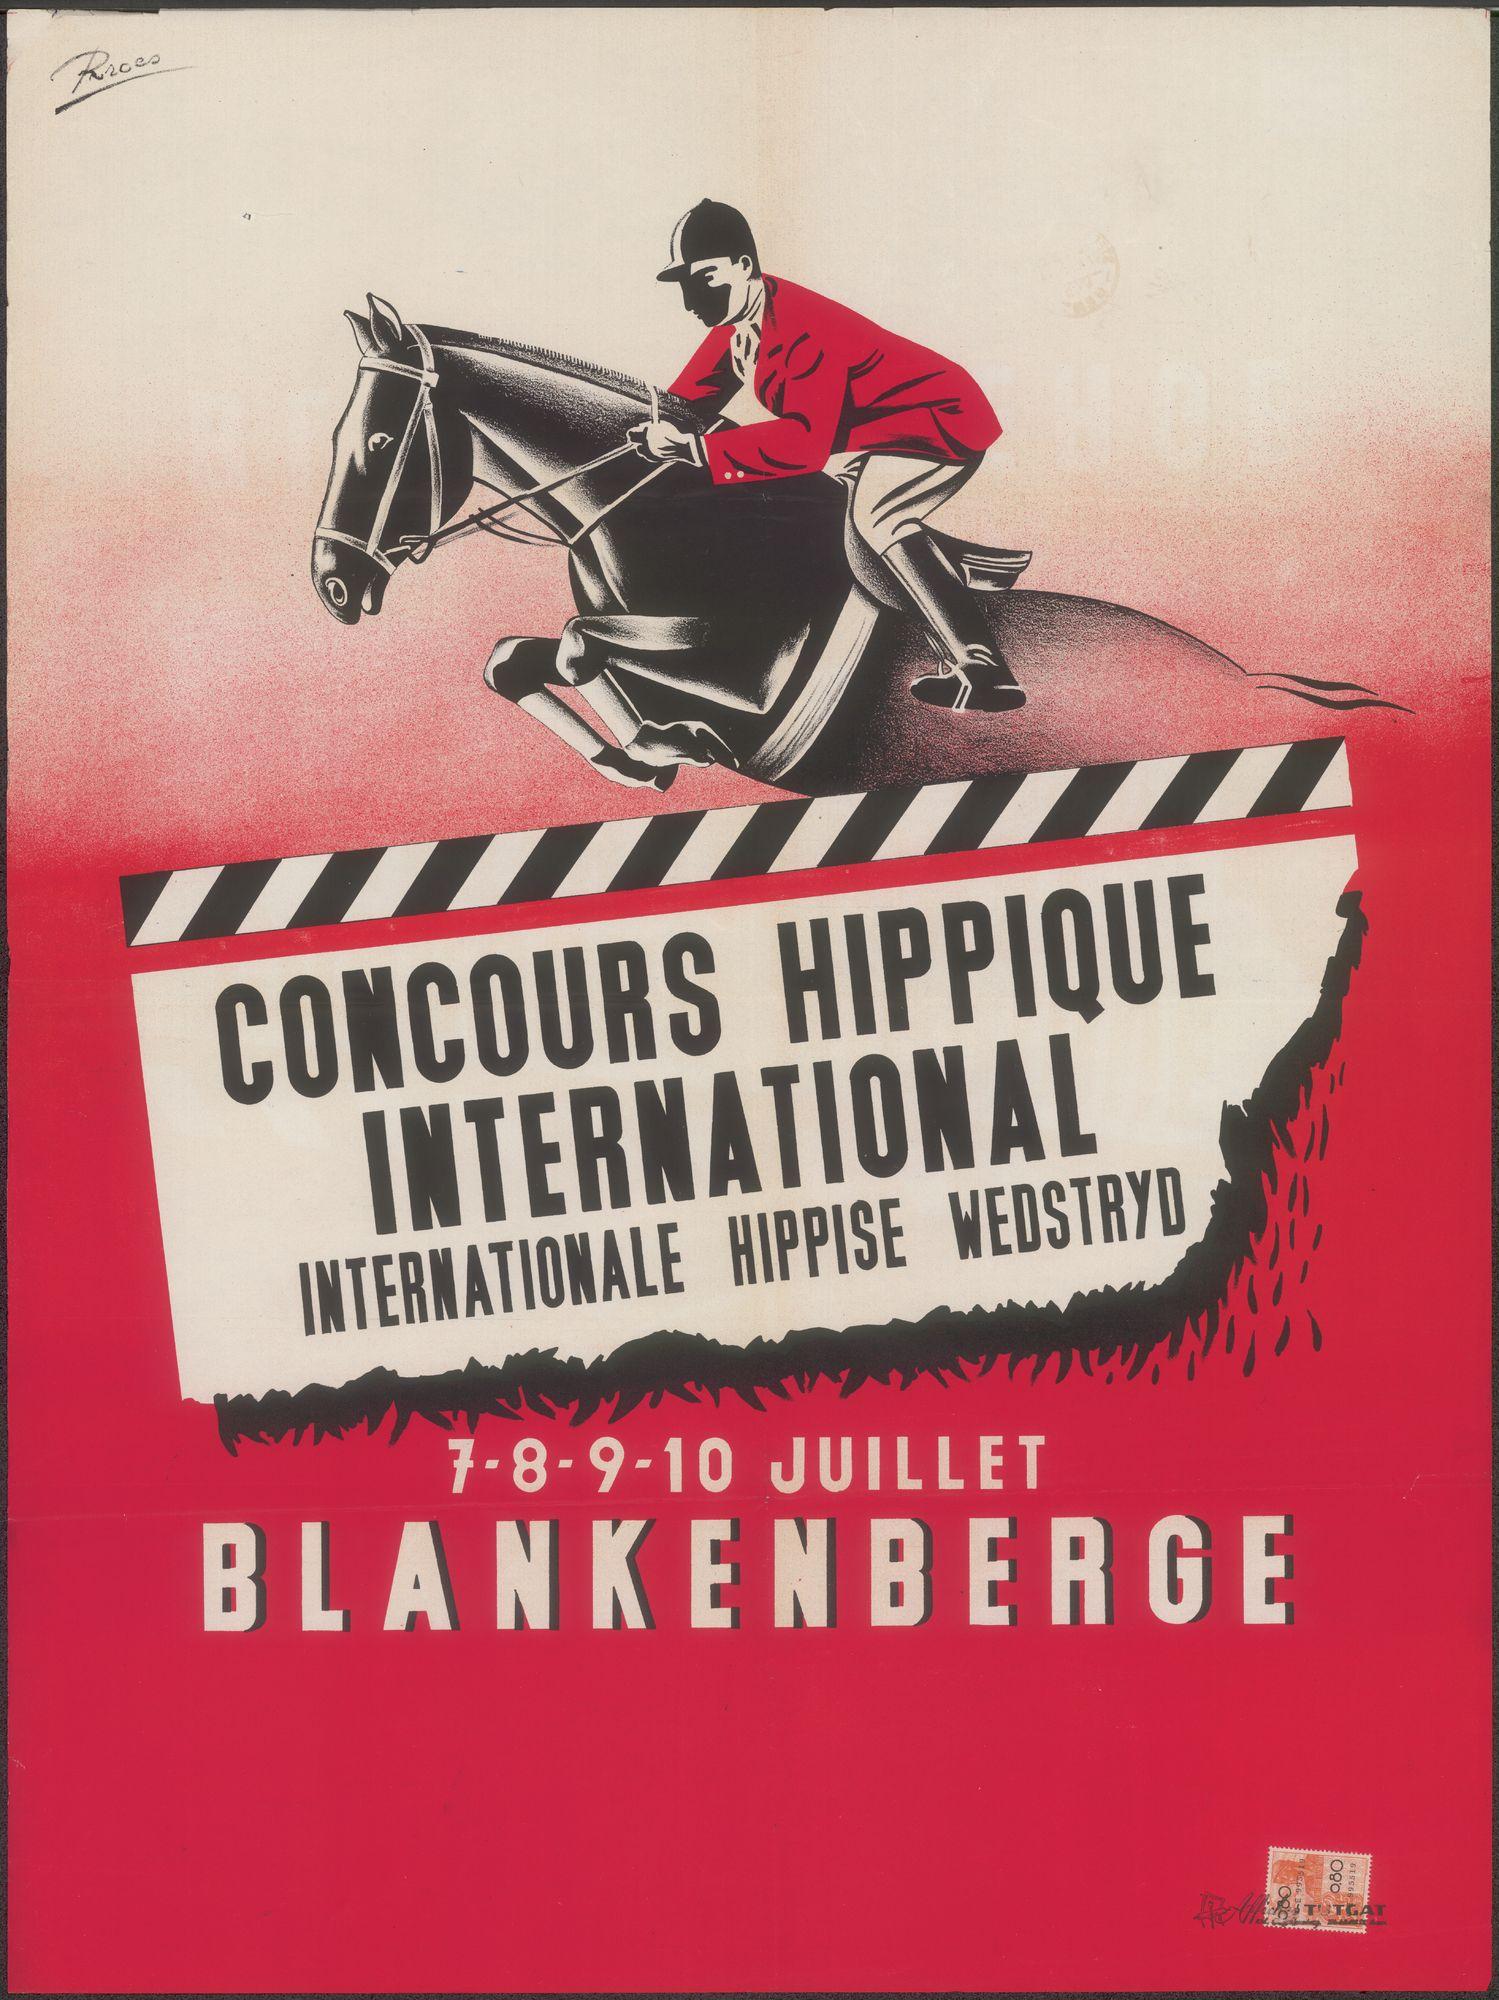 Concours Hippique International | Internationale Hippise Wedstrijd, Blankenberg, 7 - 8 -9 - 10 juillet 1950